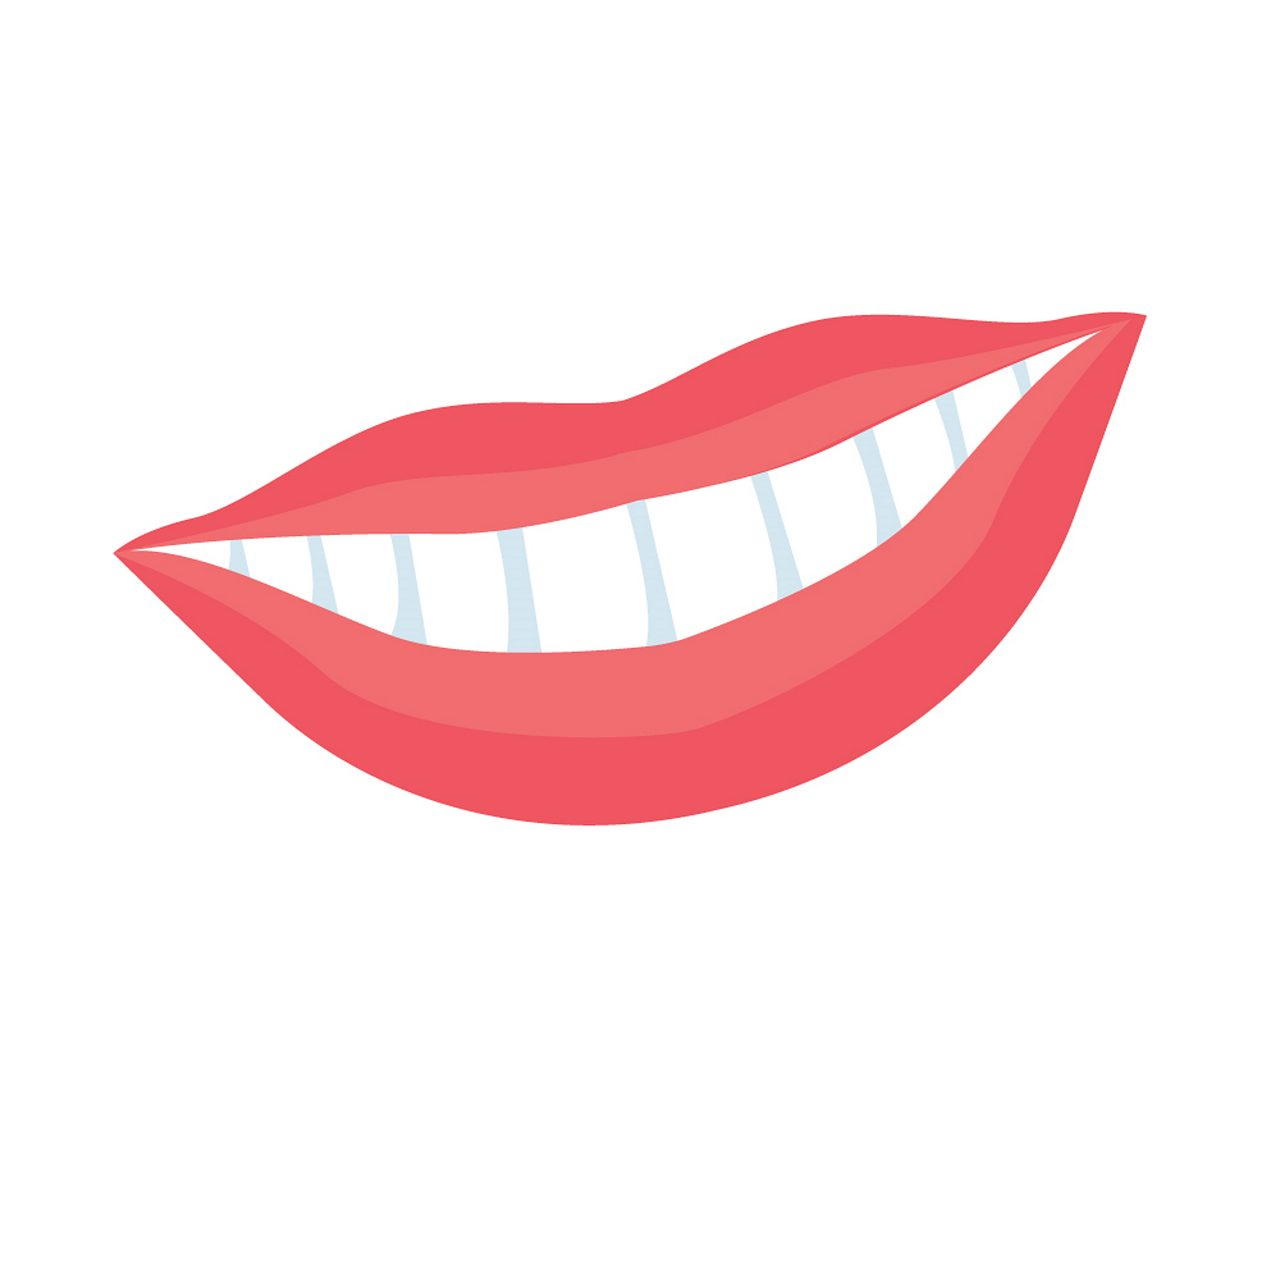 Winssen Tandartspraktijk tandarts